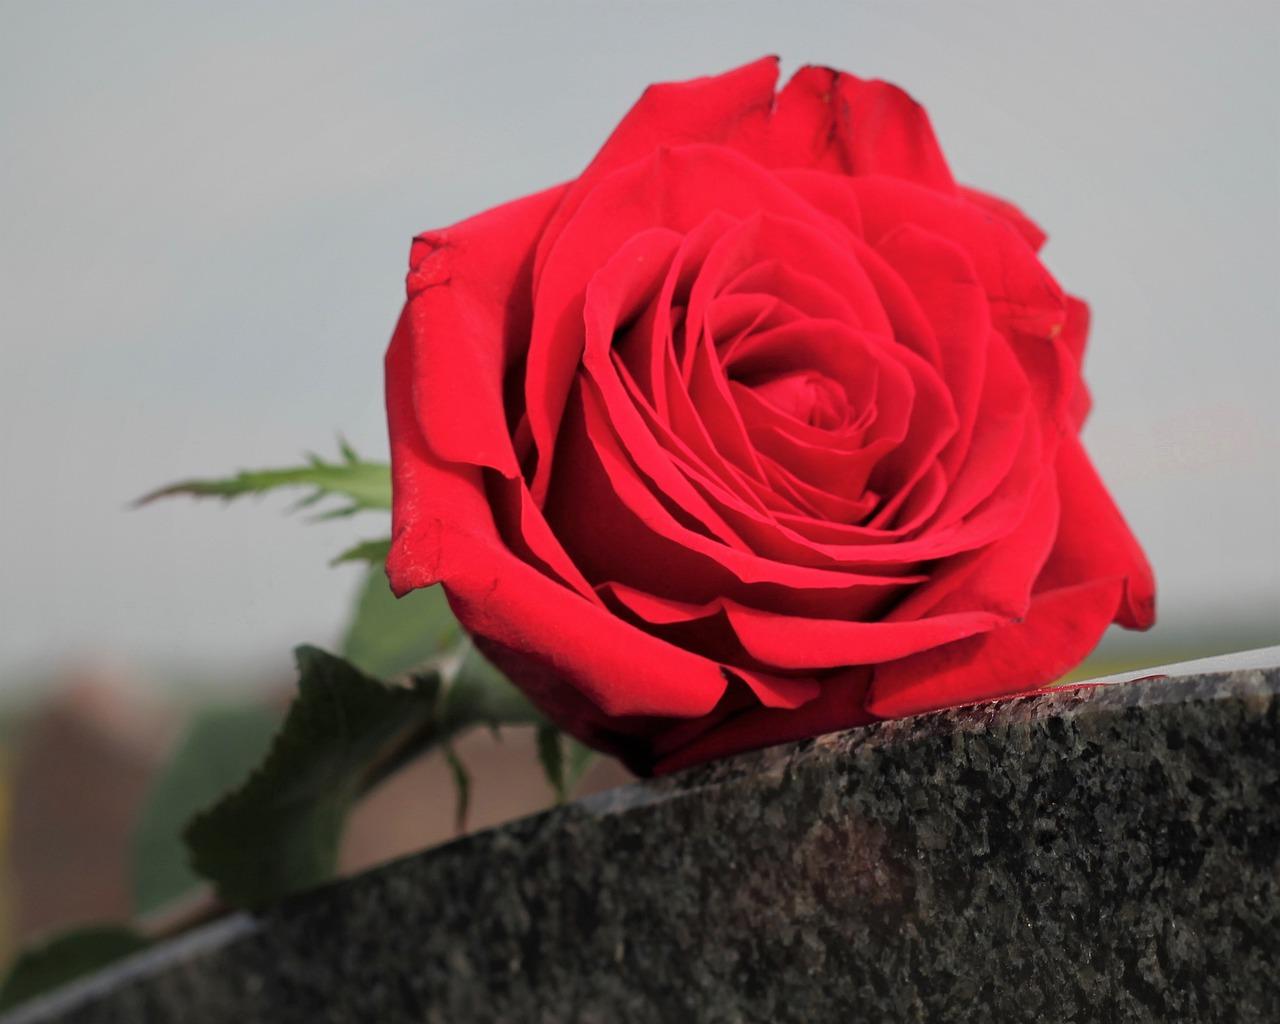 red rose, love symbol, black marble